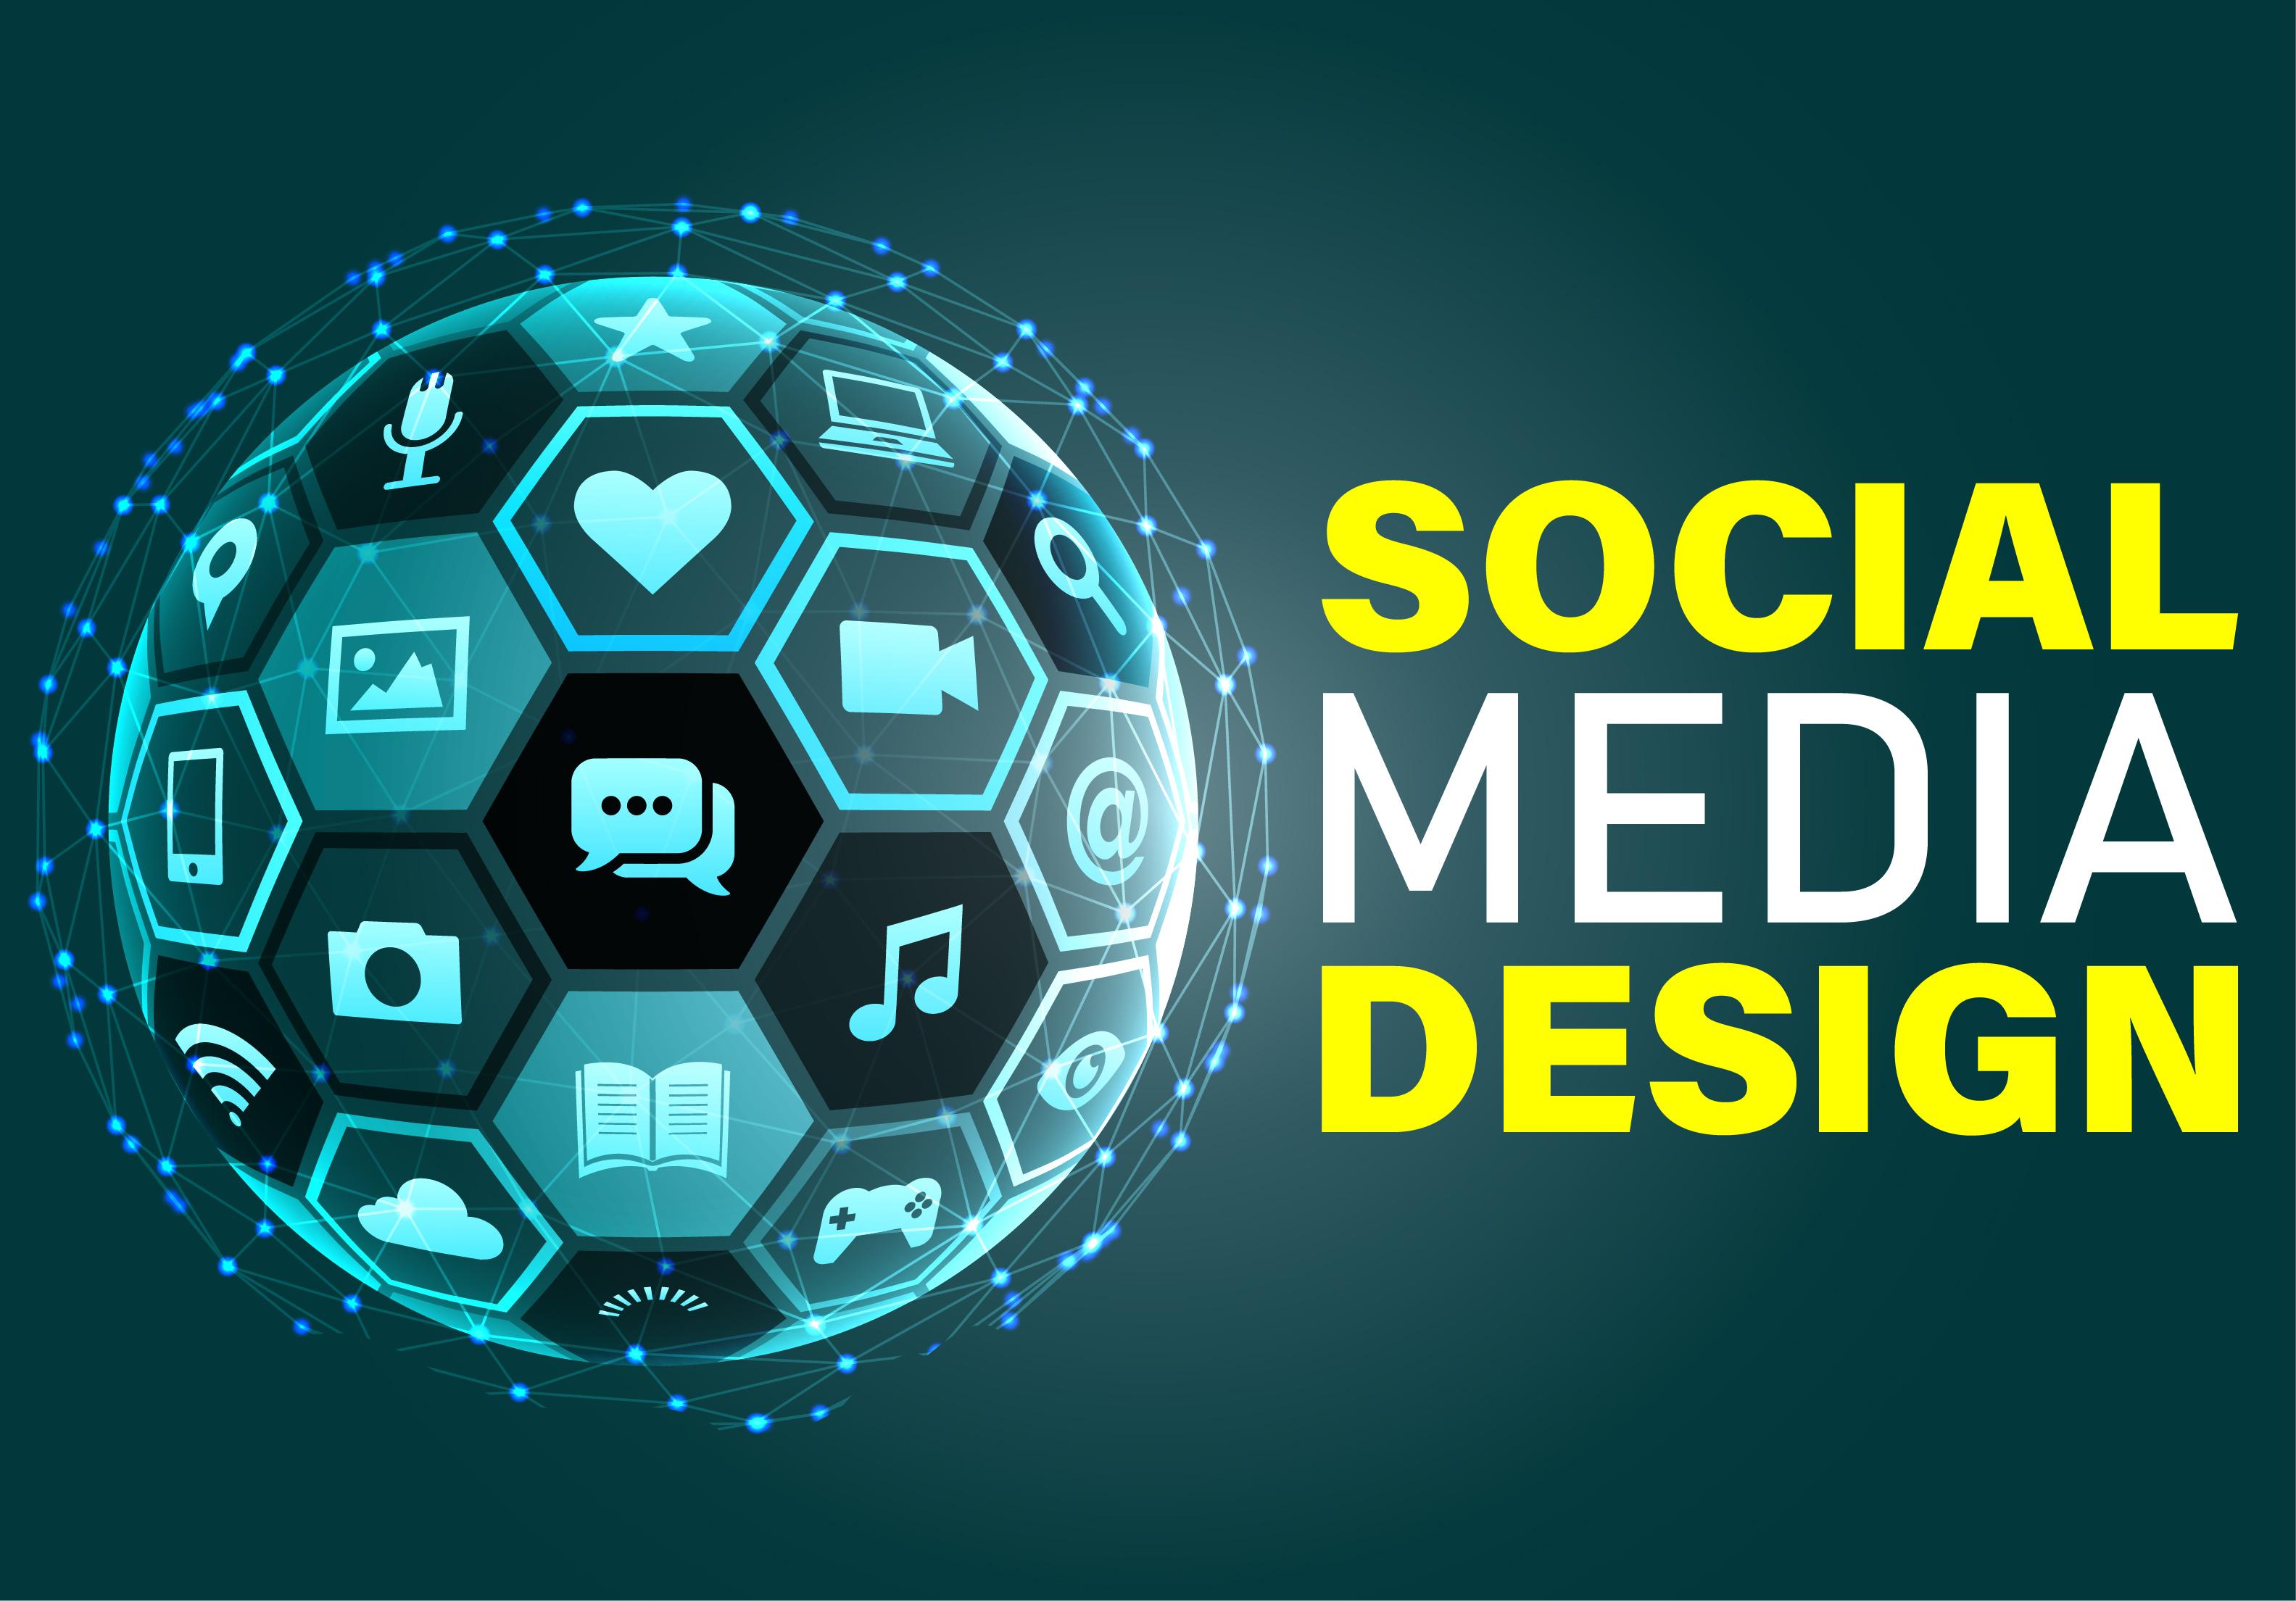 I will create your social media design